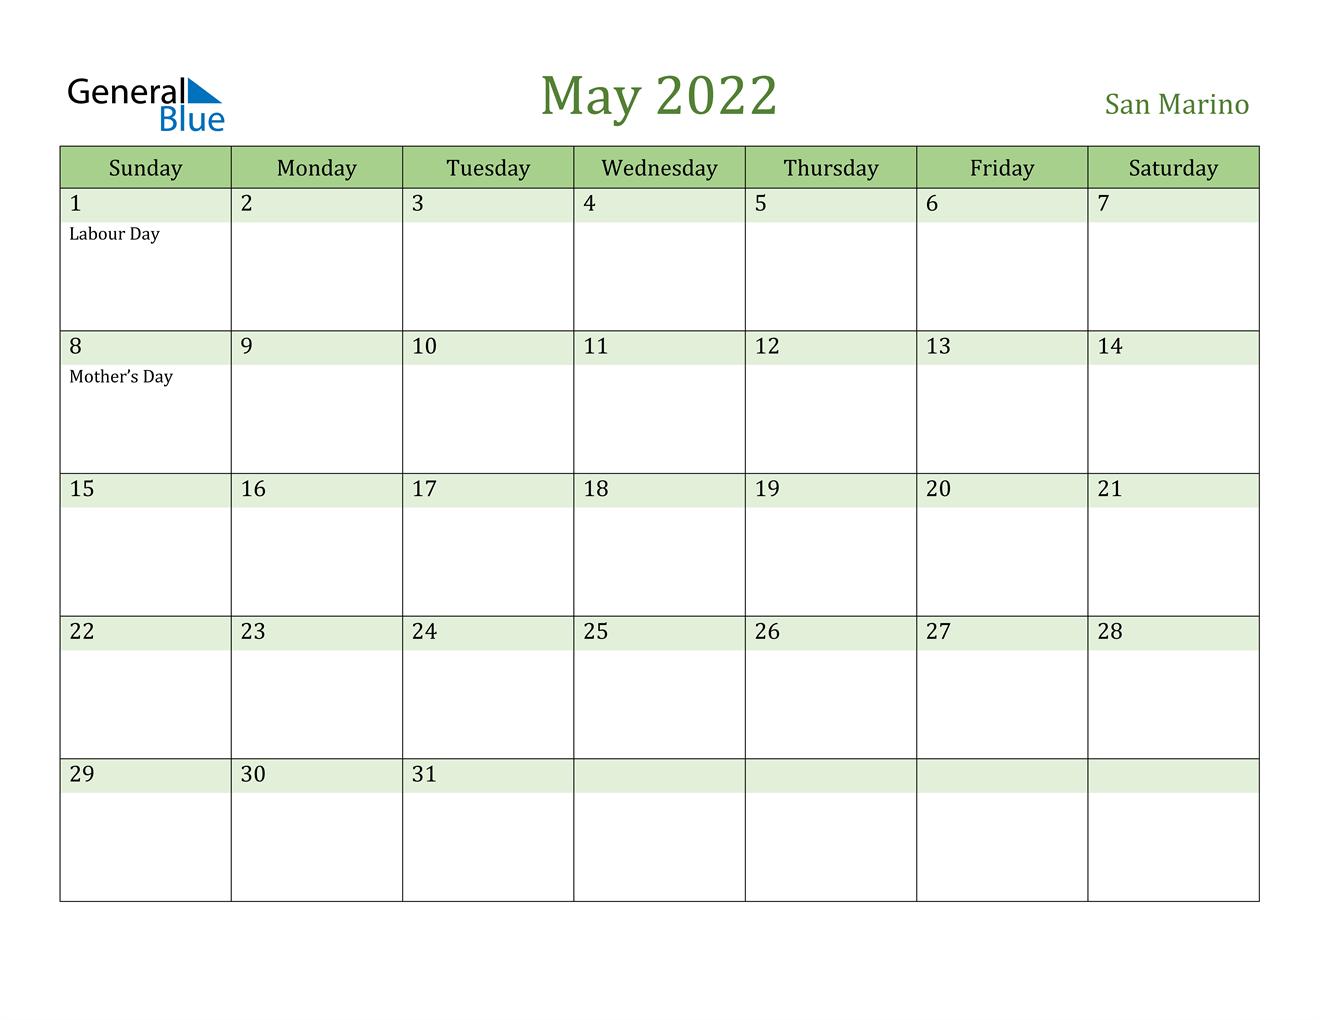 May 2022 Calendar - San Marino